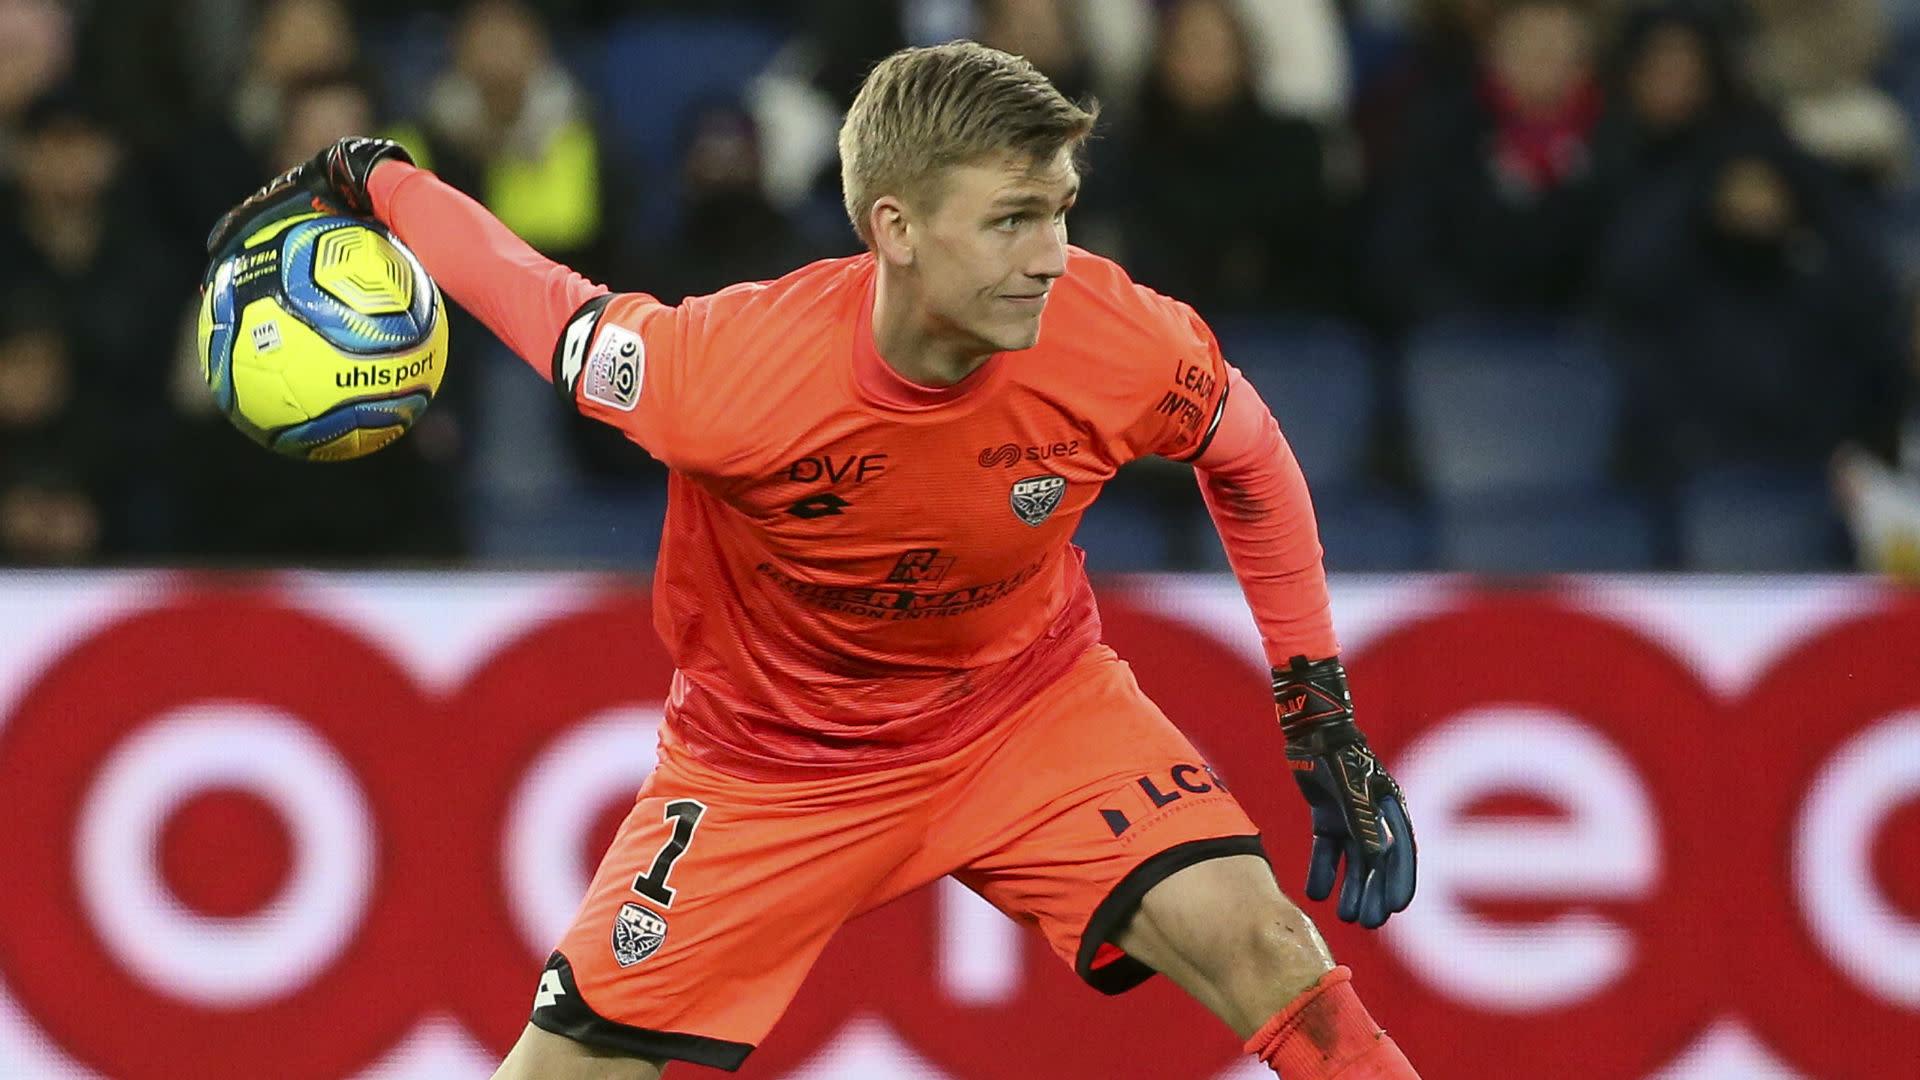 Arsenal bring in Runarsson following Martinez's departure